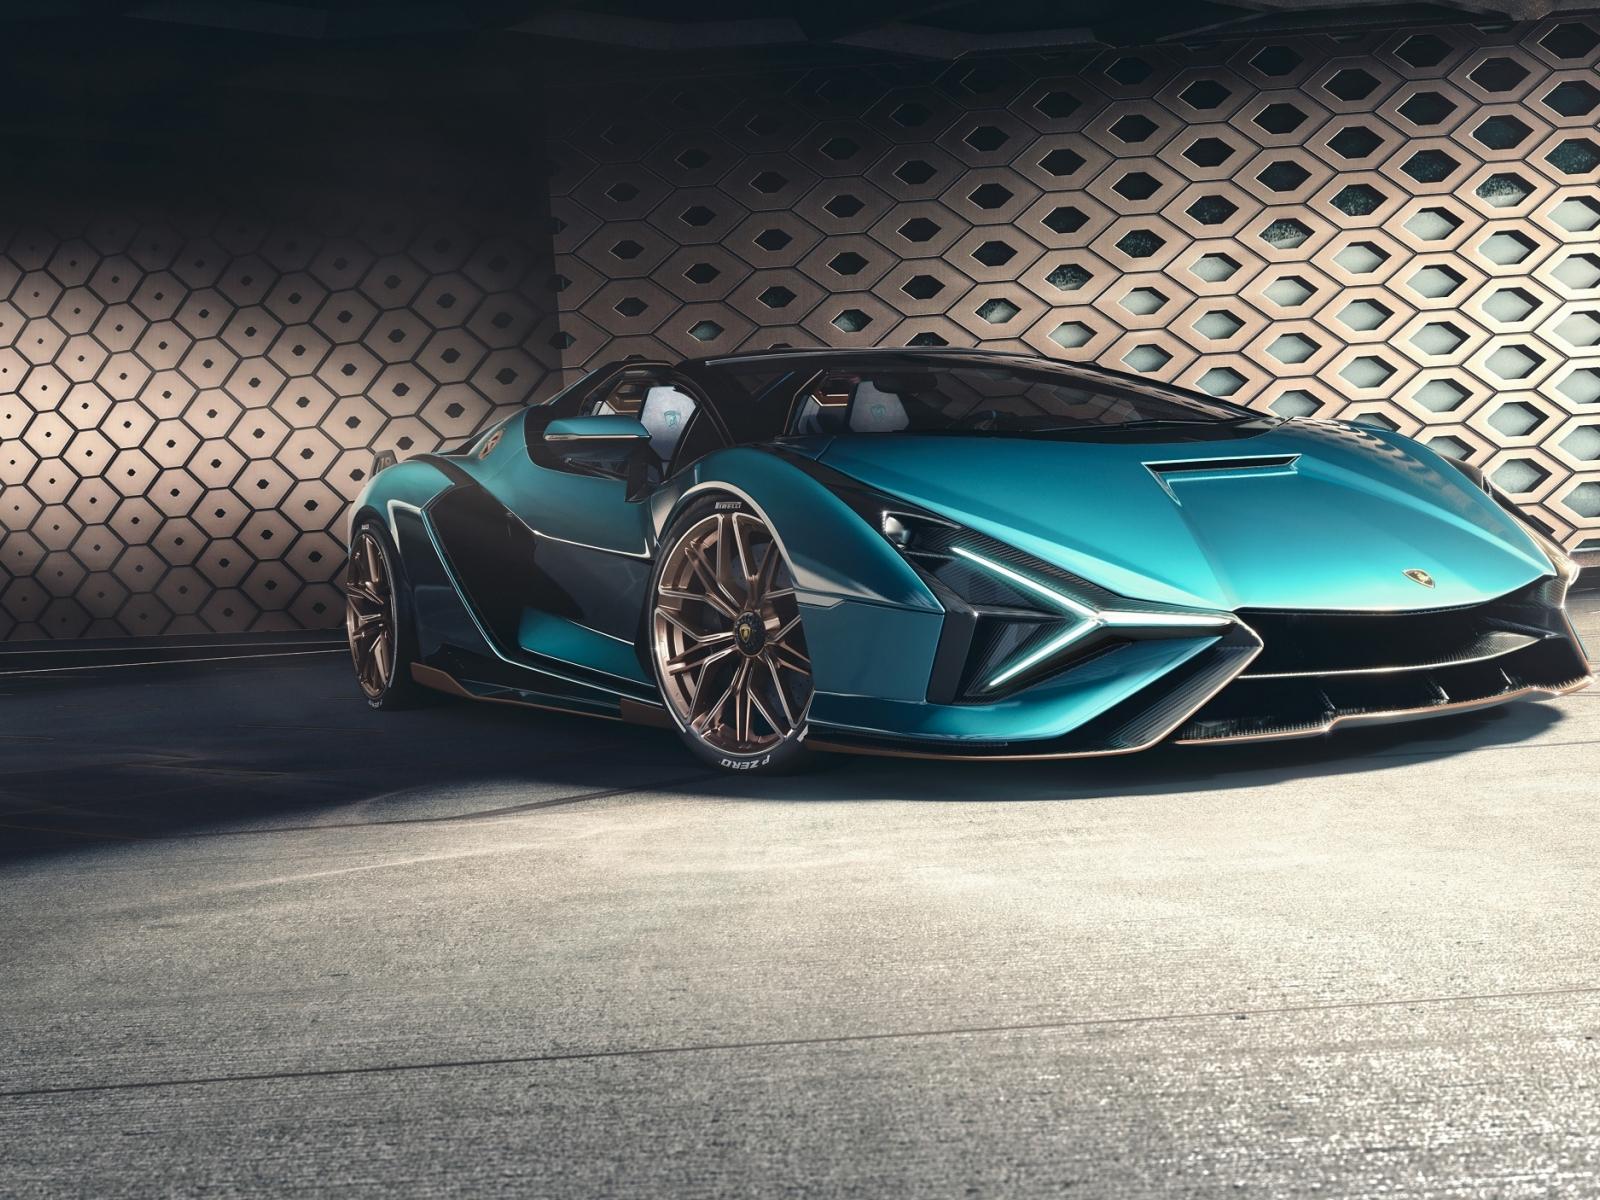 Desktop Wallpaper Blue Lamborghini Sián Fkp 37, 2020, Hd ...